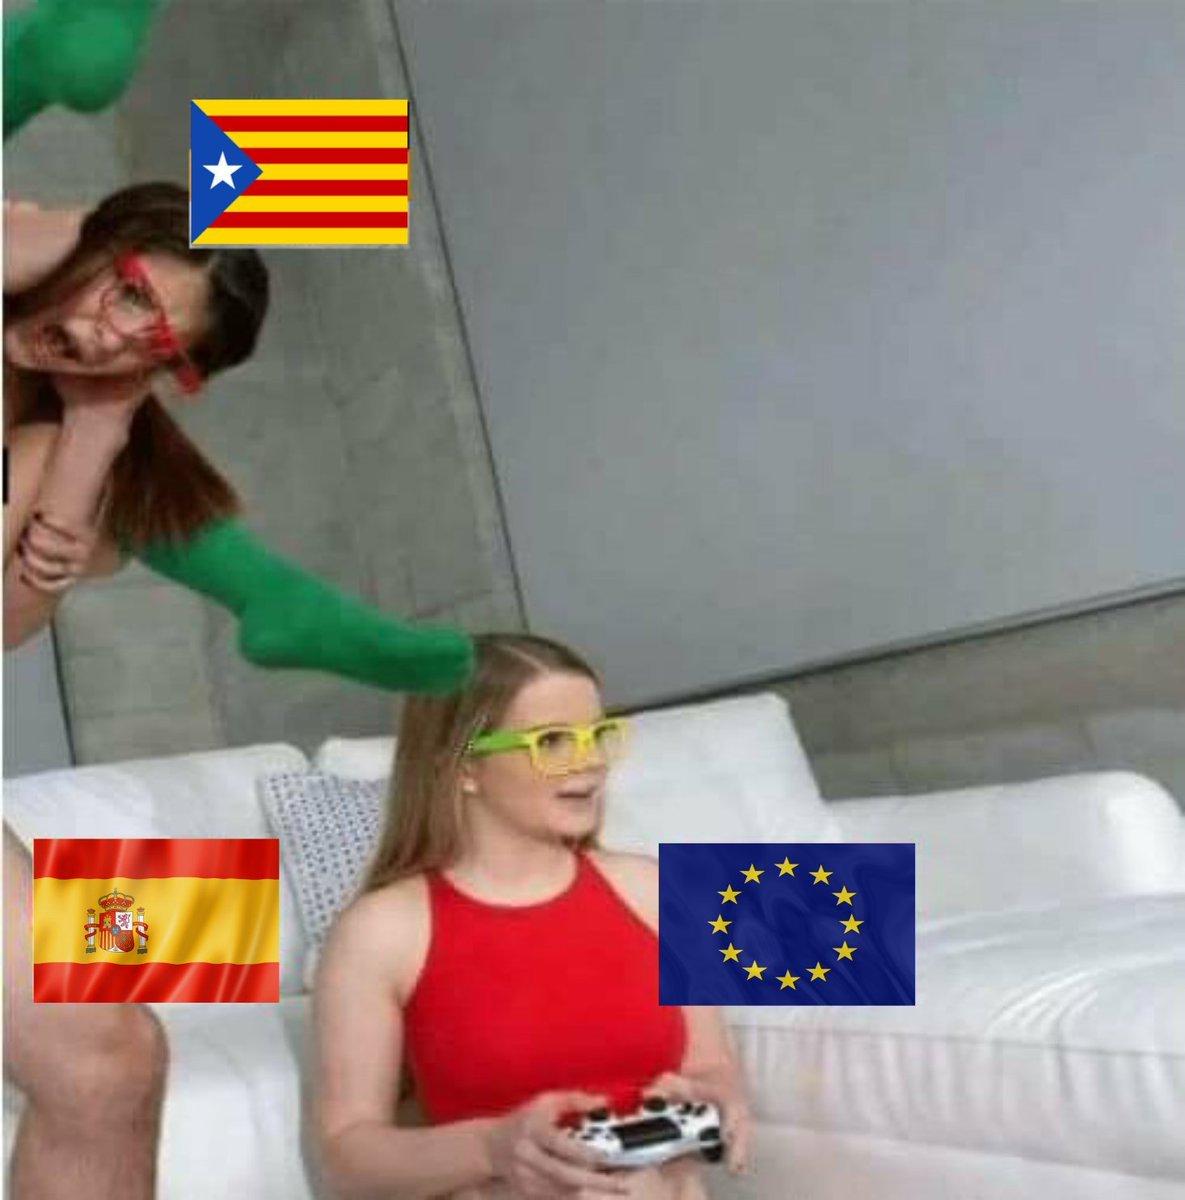 Коротко о референдуме в Каталонии - ЯПлакалъ